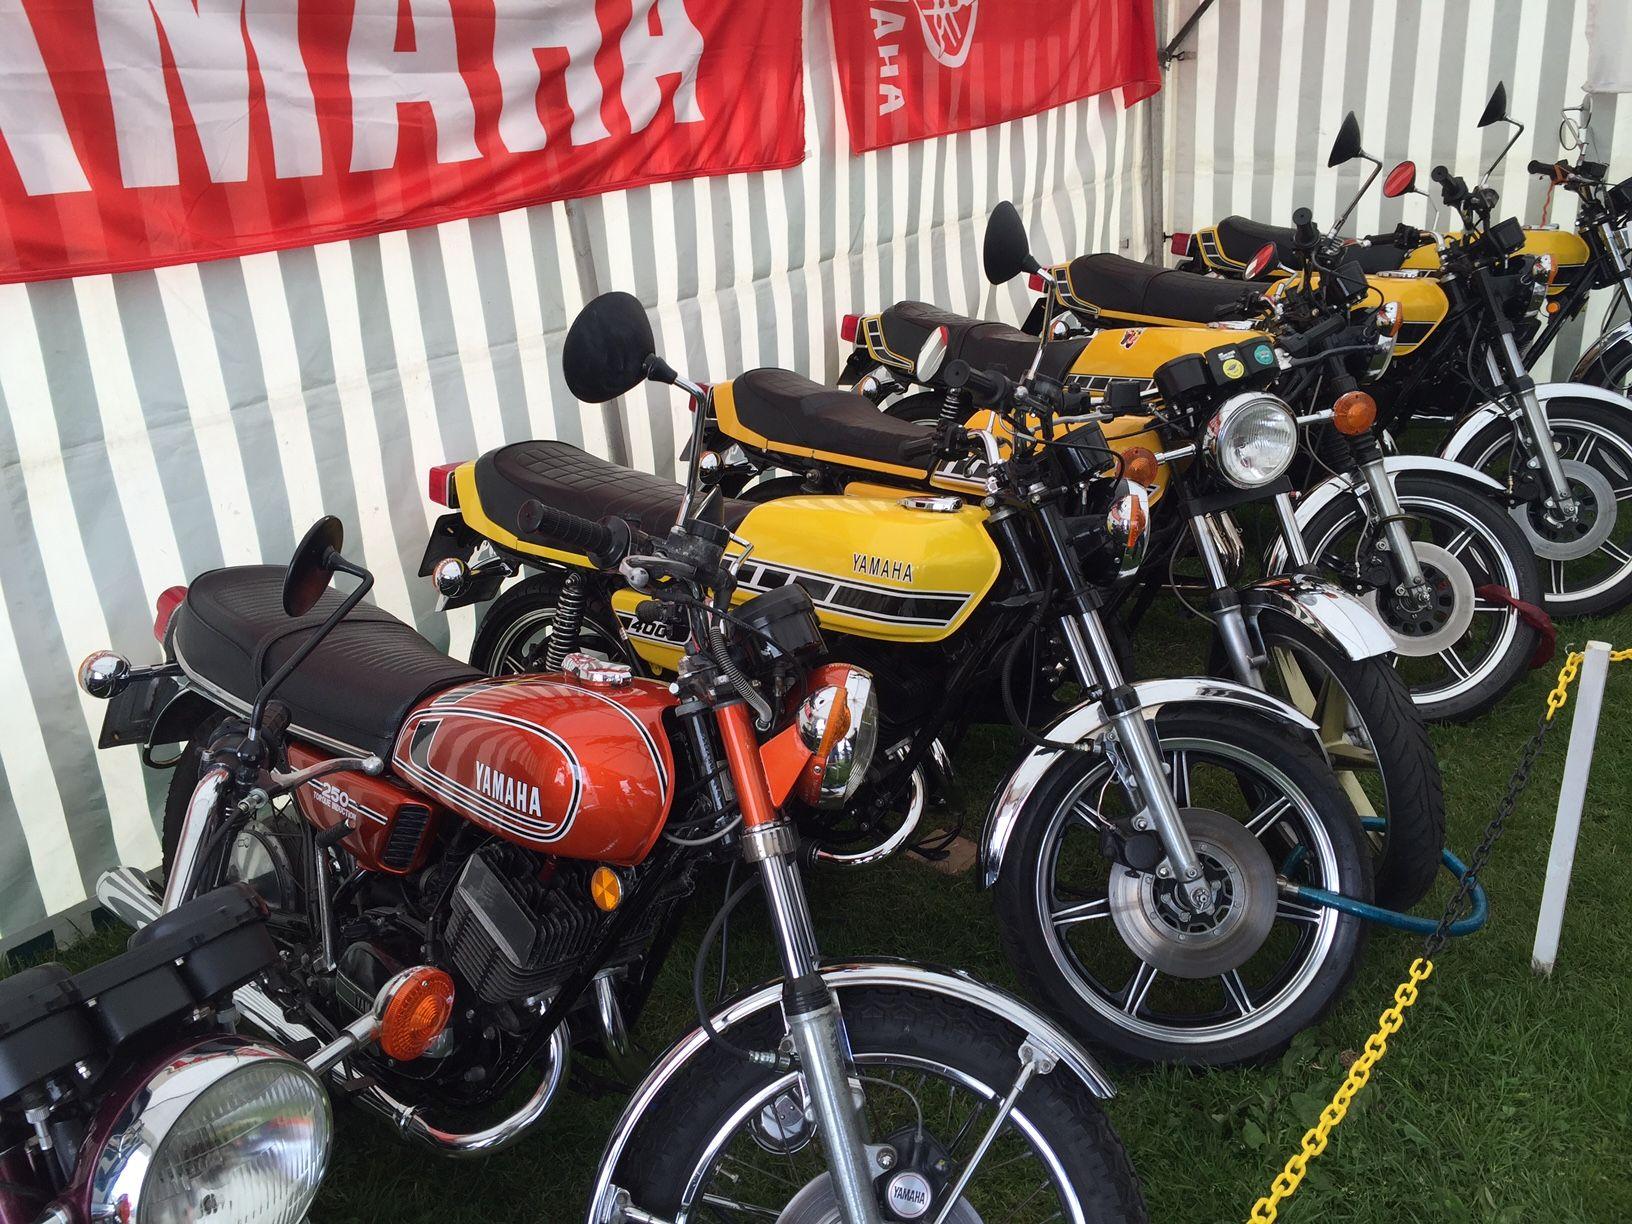 Future Classic Bike Insurance for iconic motorcycles | BeMoto